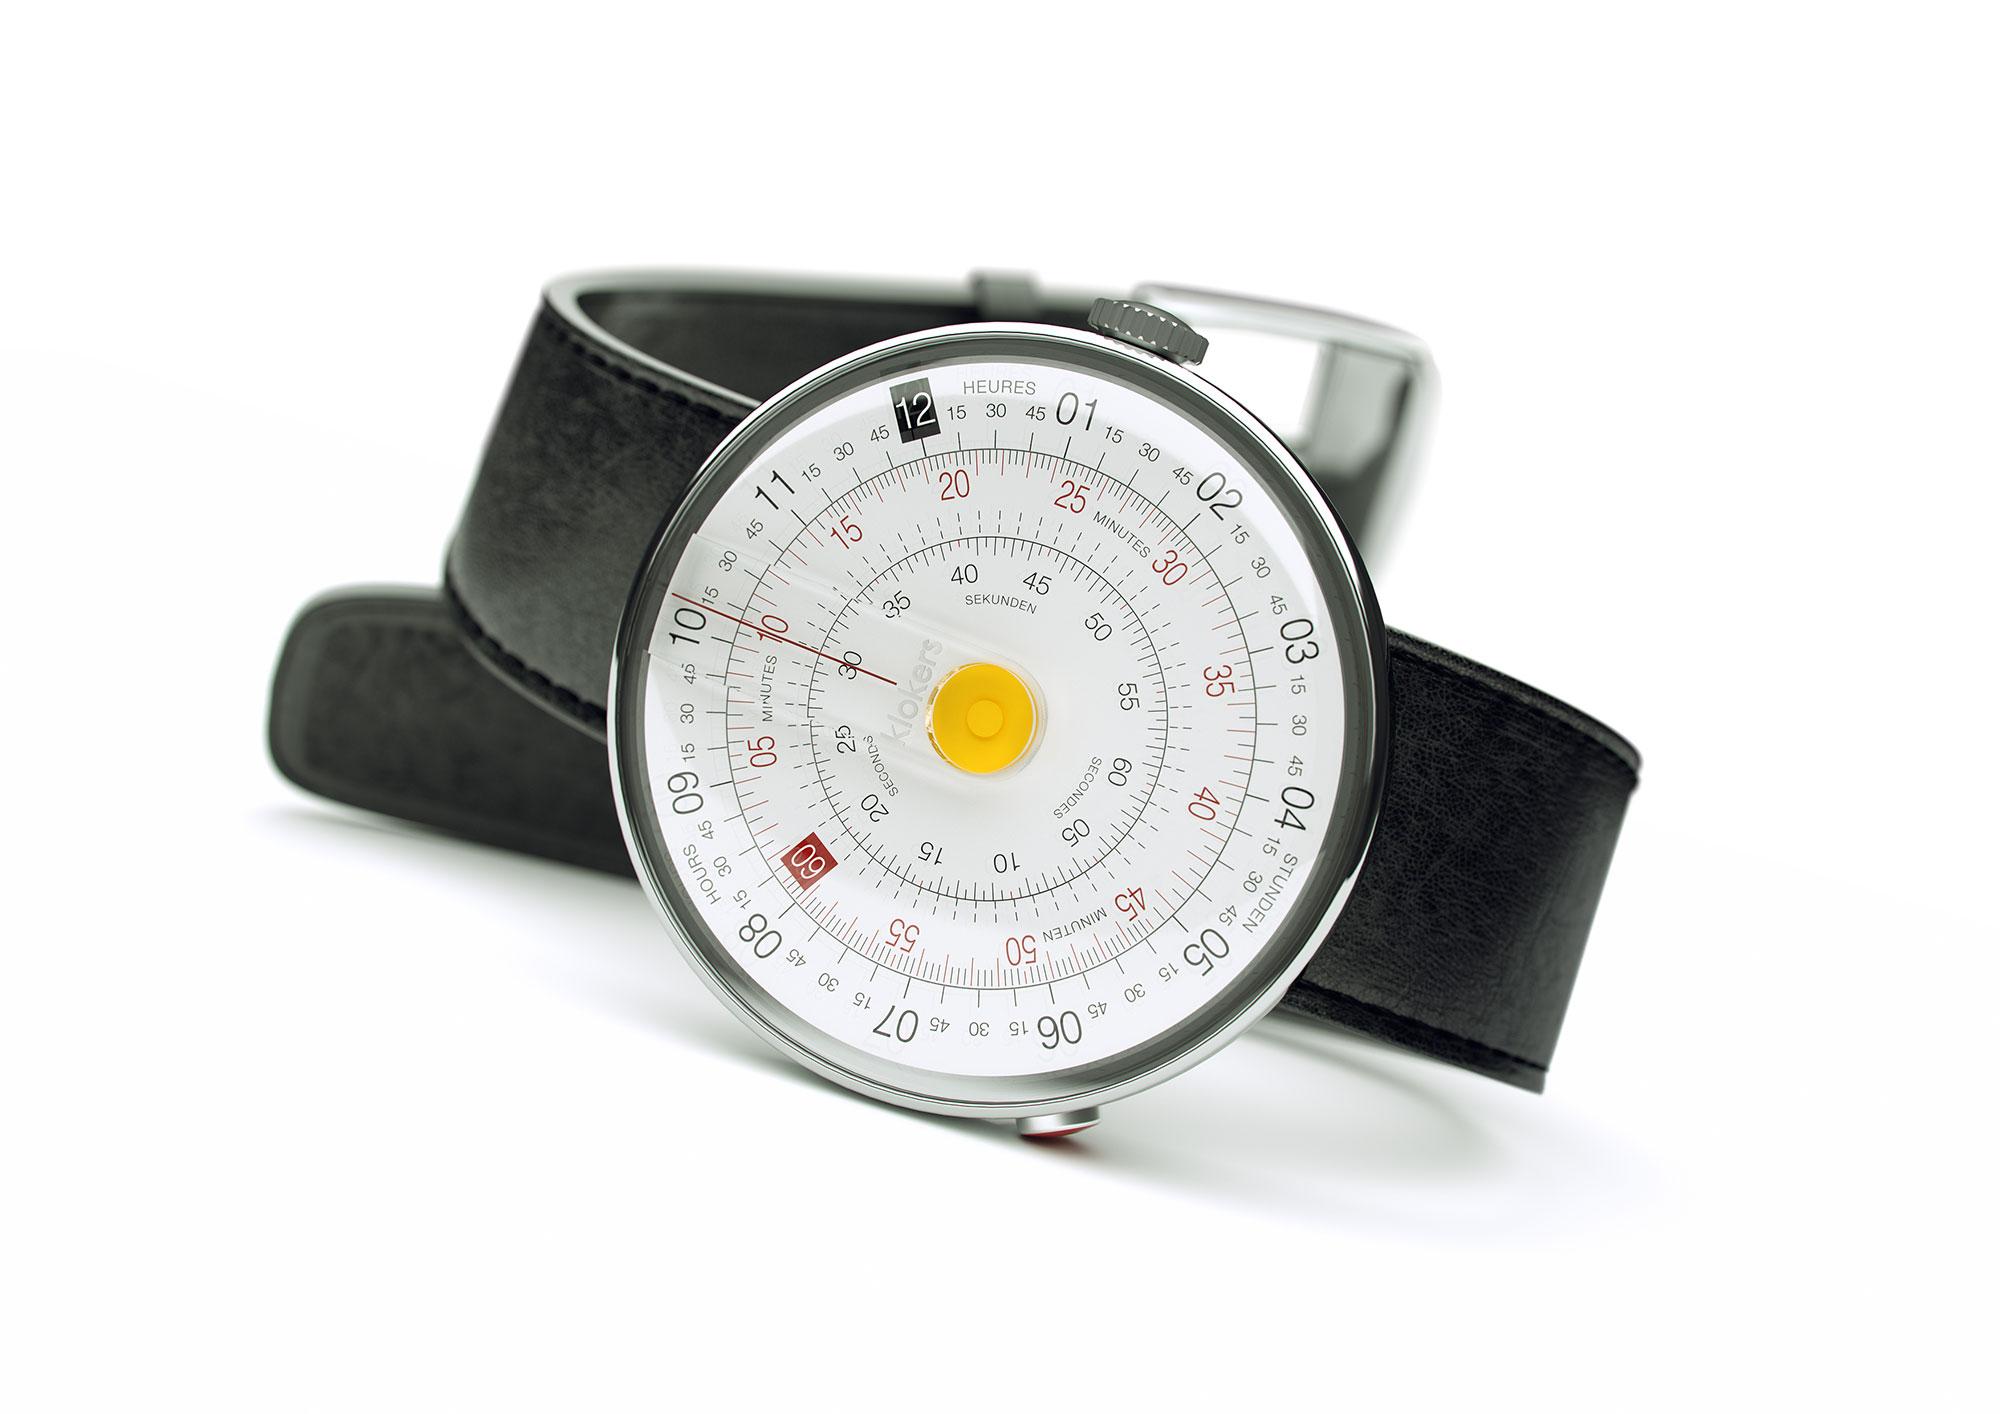 Montre-Klokers Klok-01-Watch-Trendy-Tendance-effronté-05